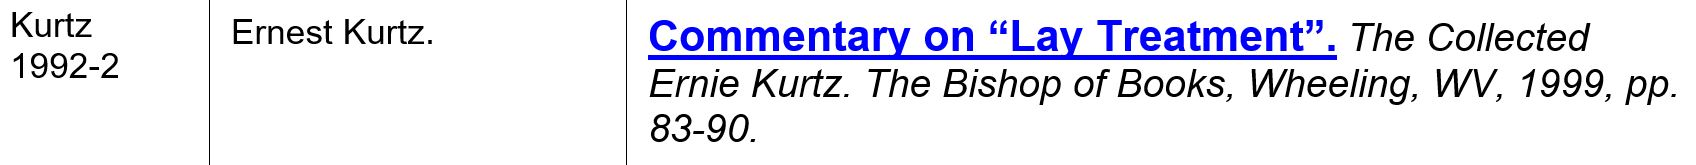 kurtz 1992-2